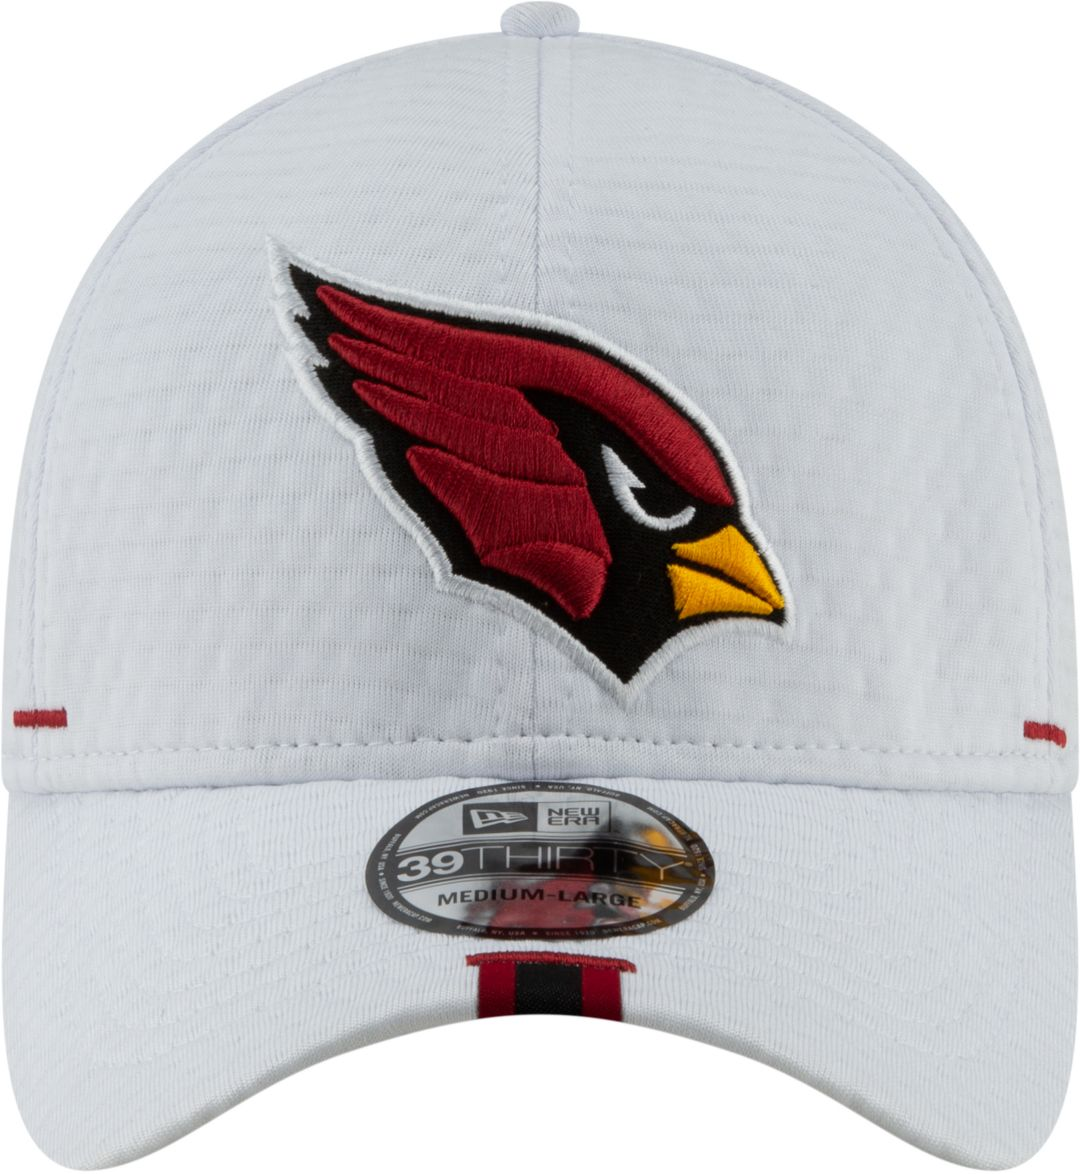 02c306c4 New Era Men's Arizona Cardinals Sideline Training Camp 39Thirty Stretch Fit  White Hat